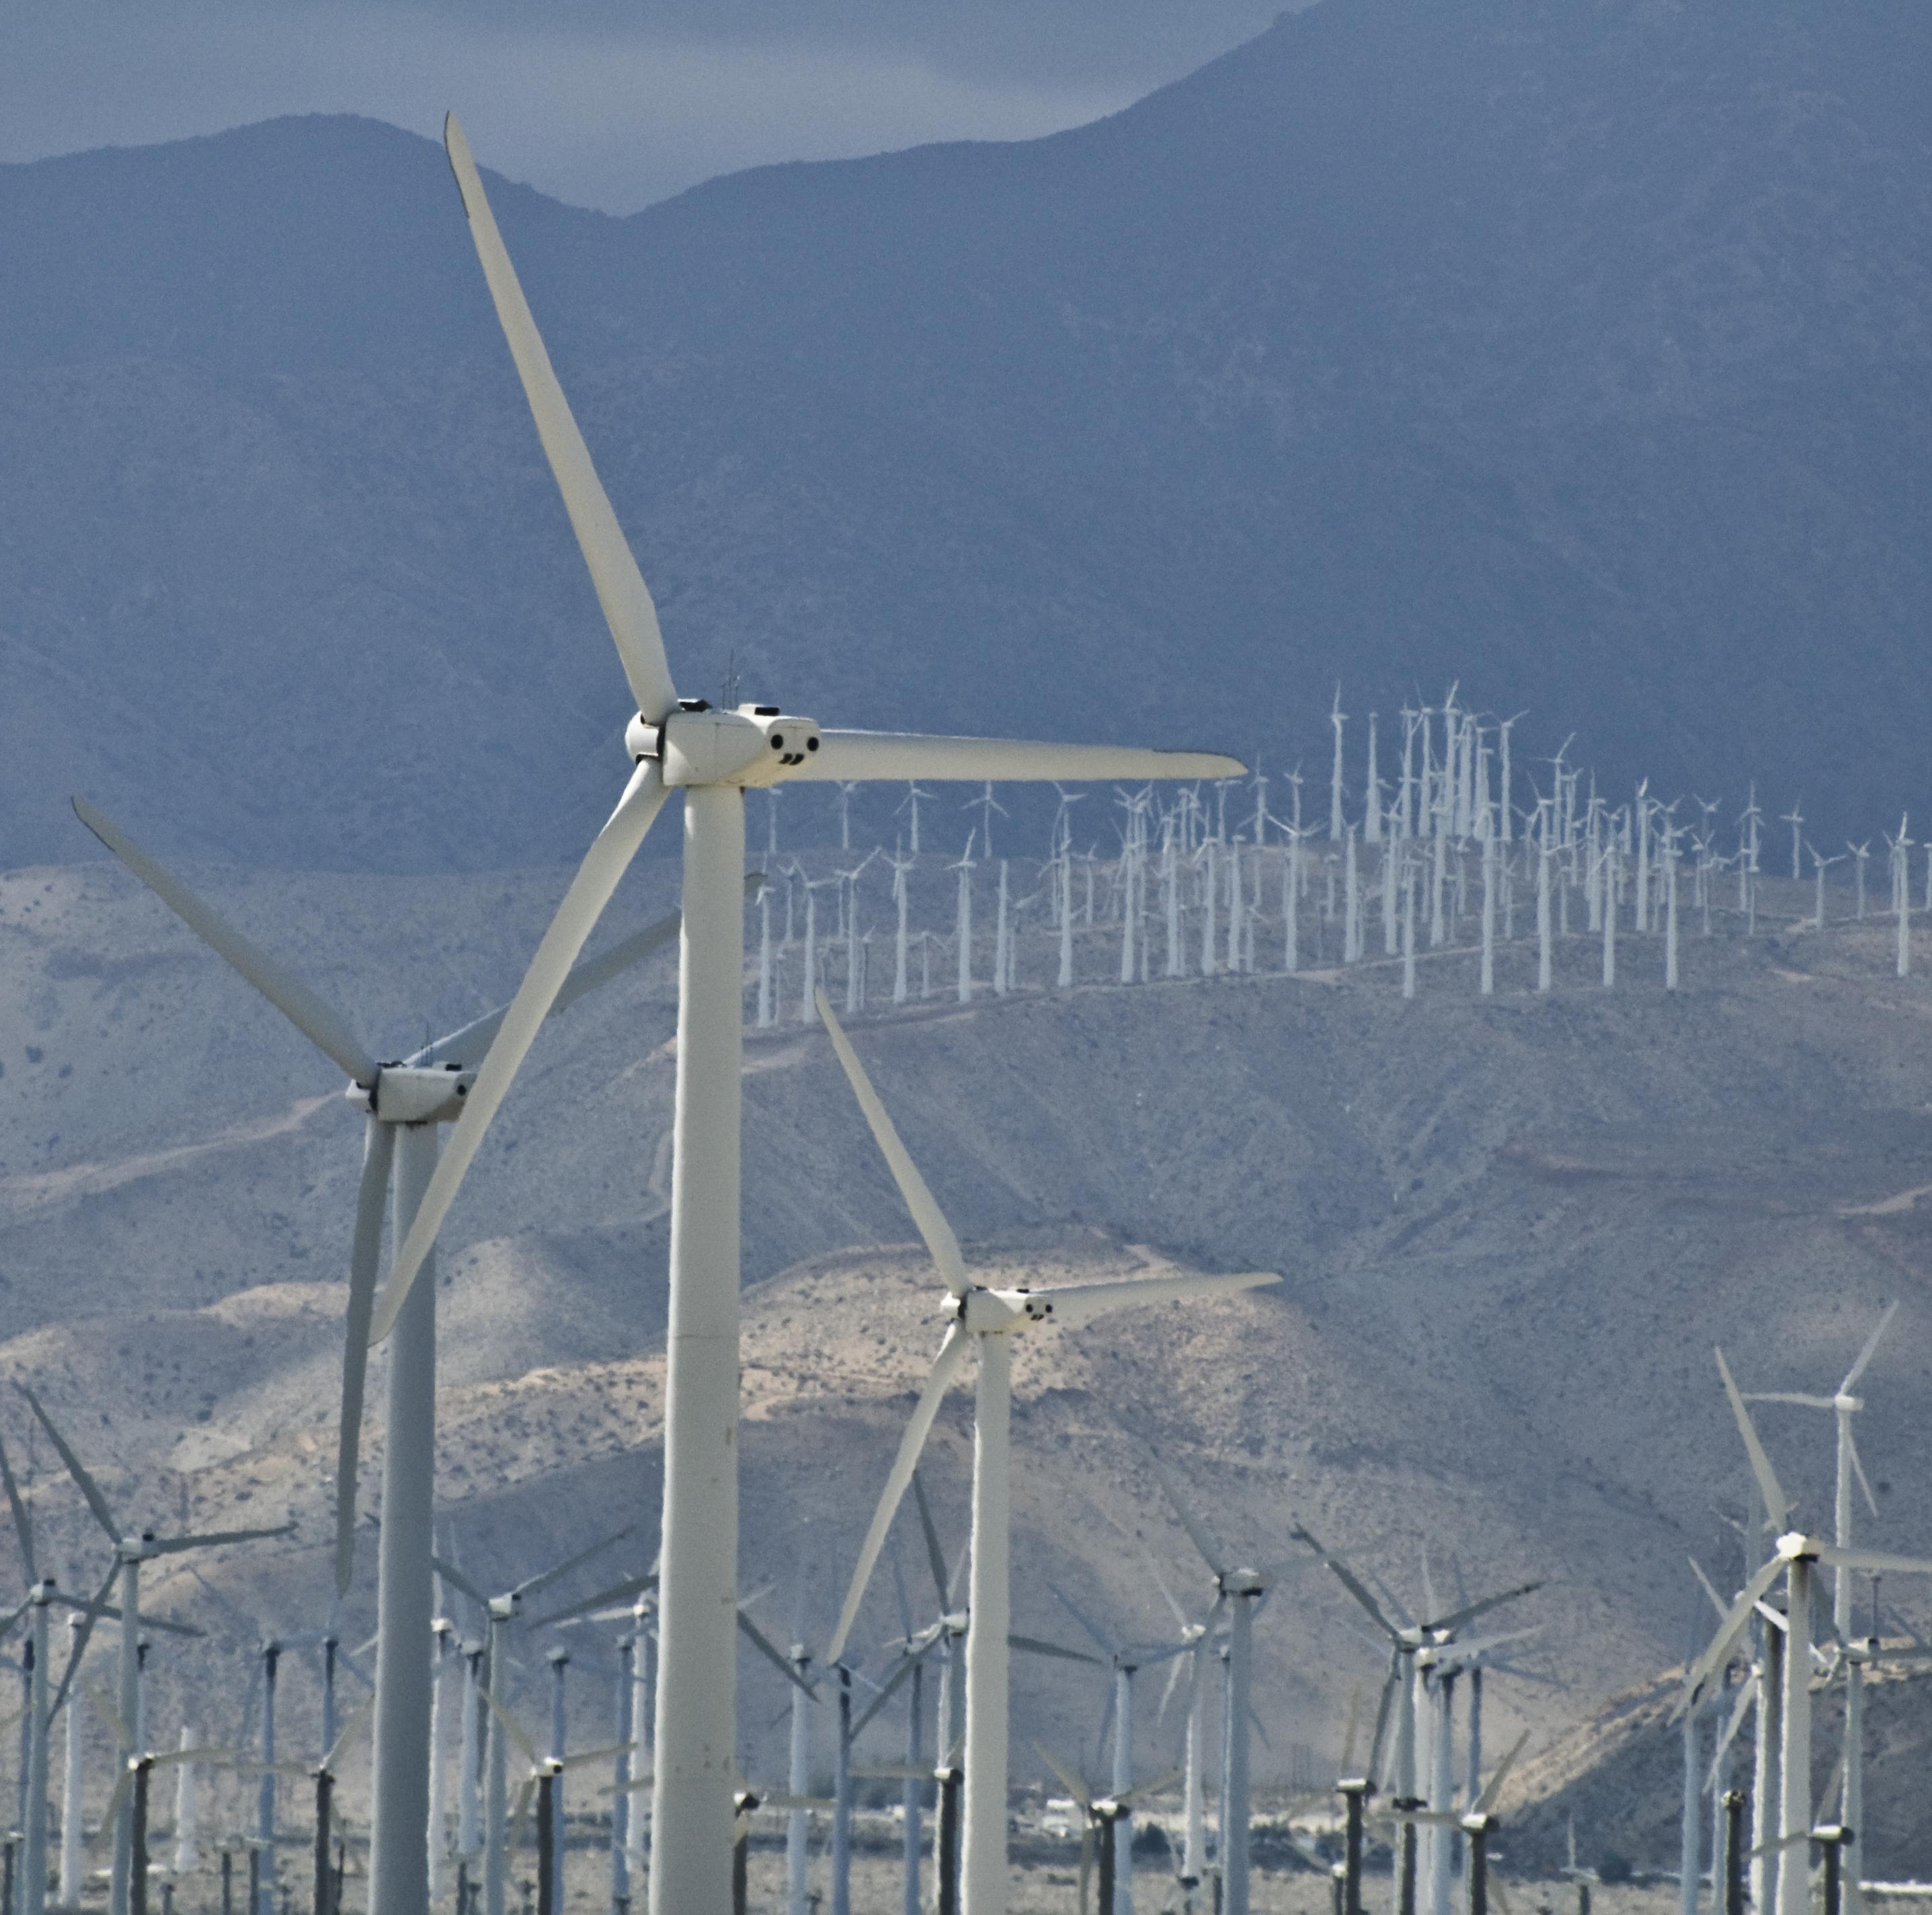 Wind Turbine 3: Cropped